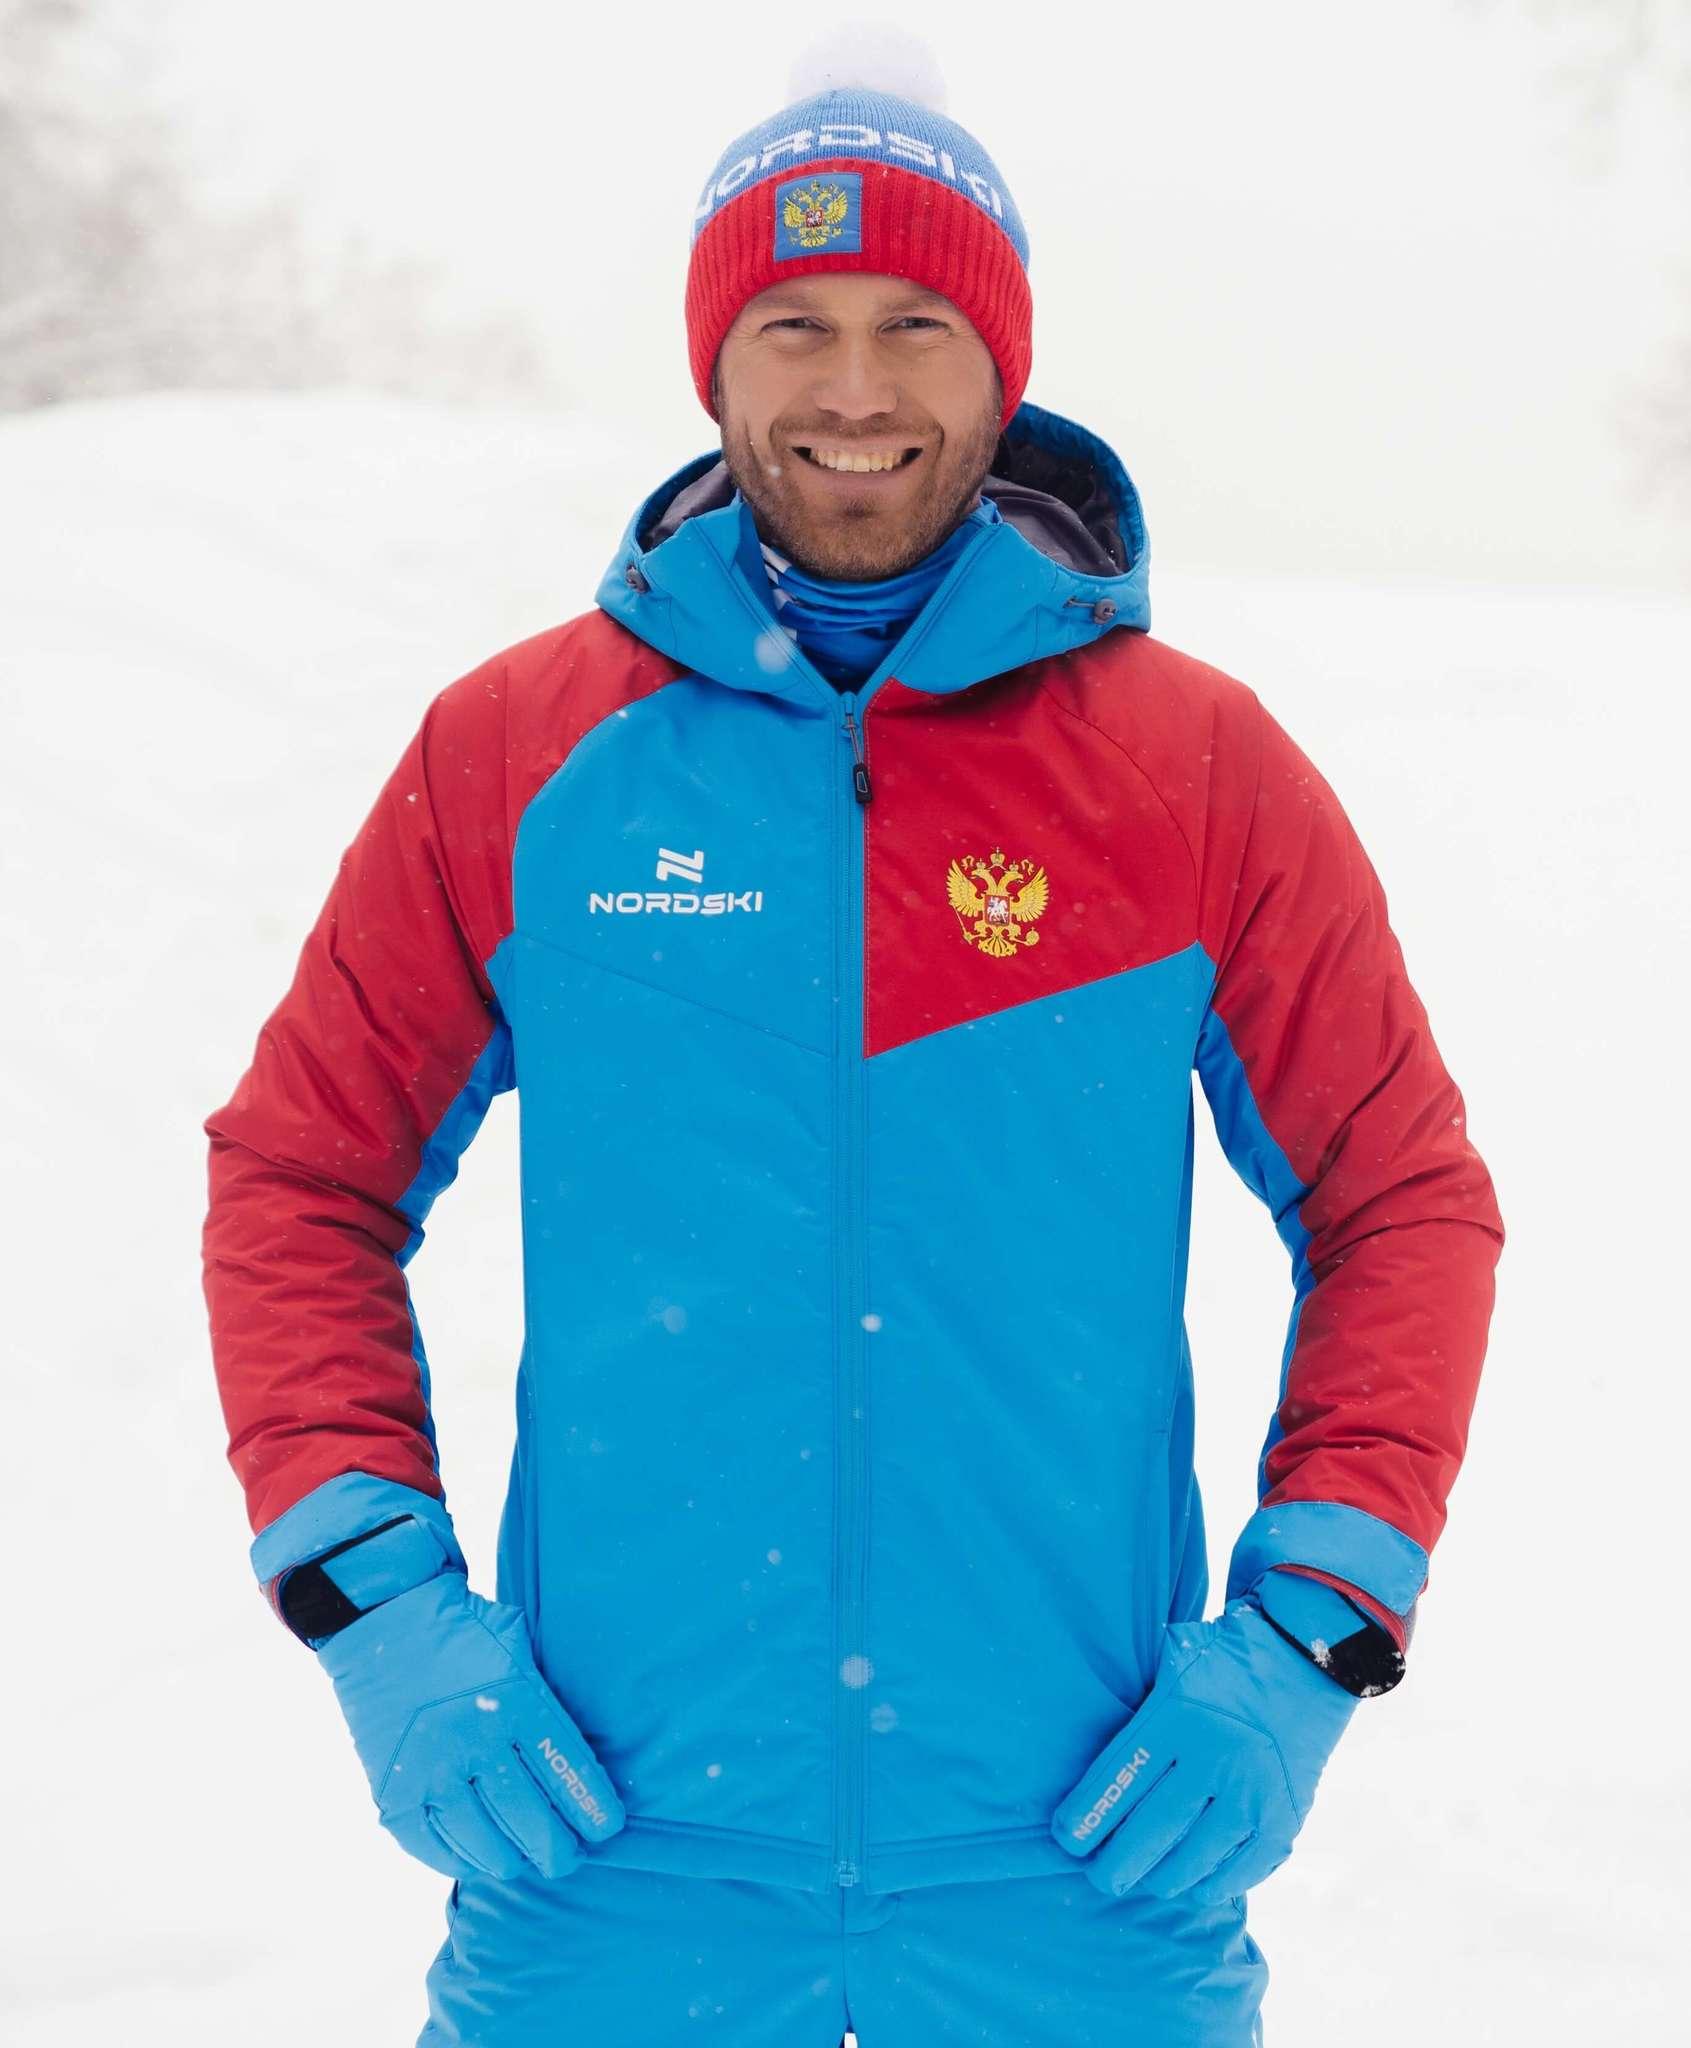 Nordski National 2.0 утепленная лыжная куртка мужская - 4